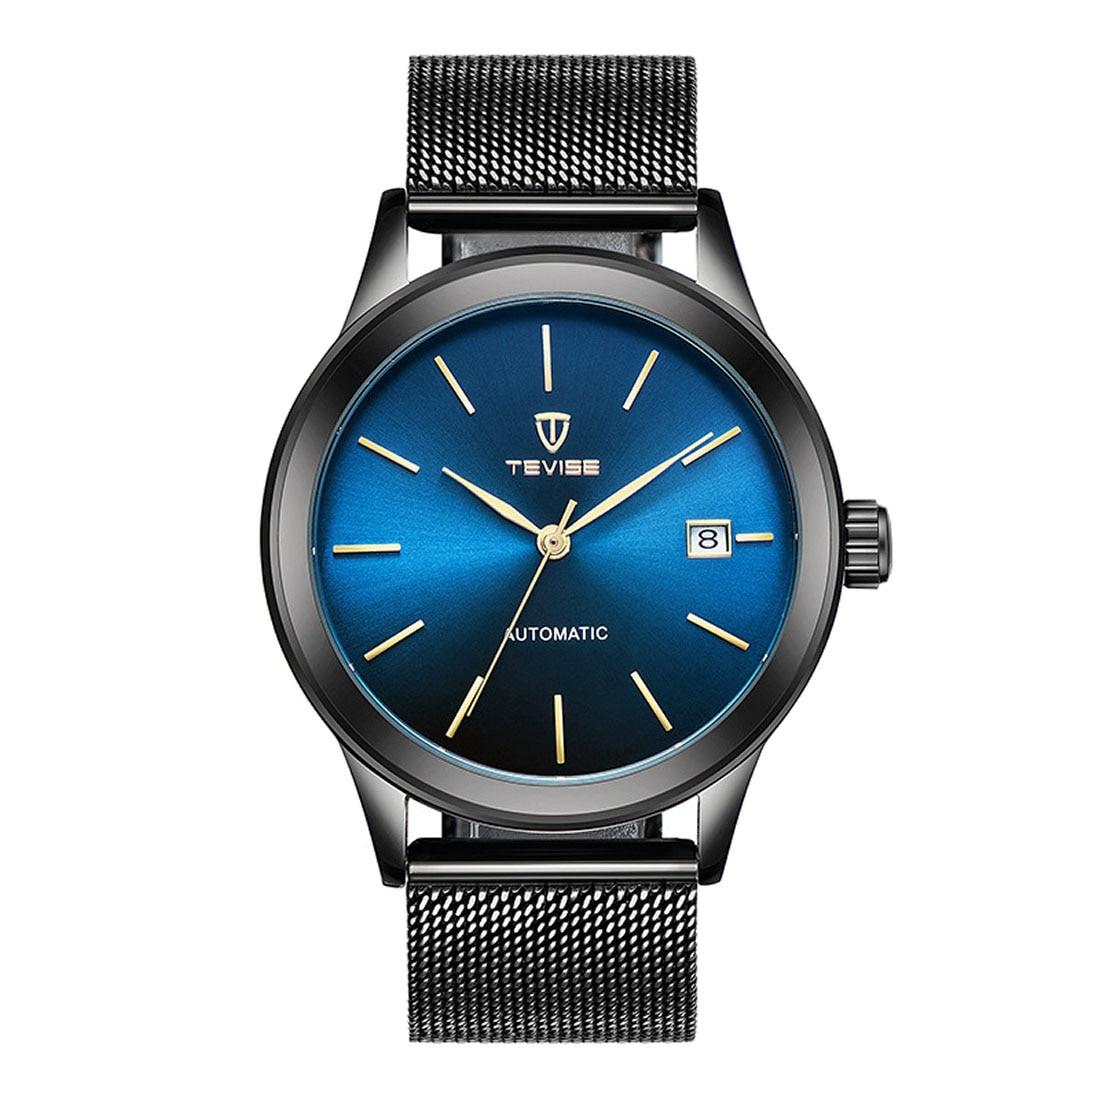 Simple quartz wristwatch men casual mesh strap business watch waterproof big dial date display sport watch new relogio masculino